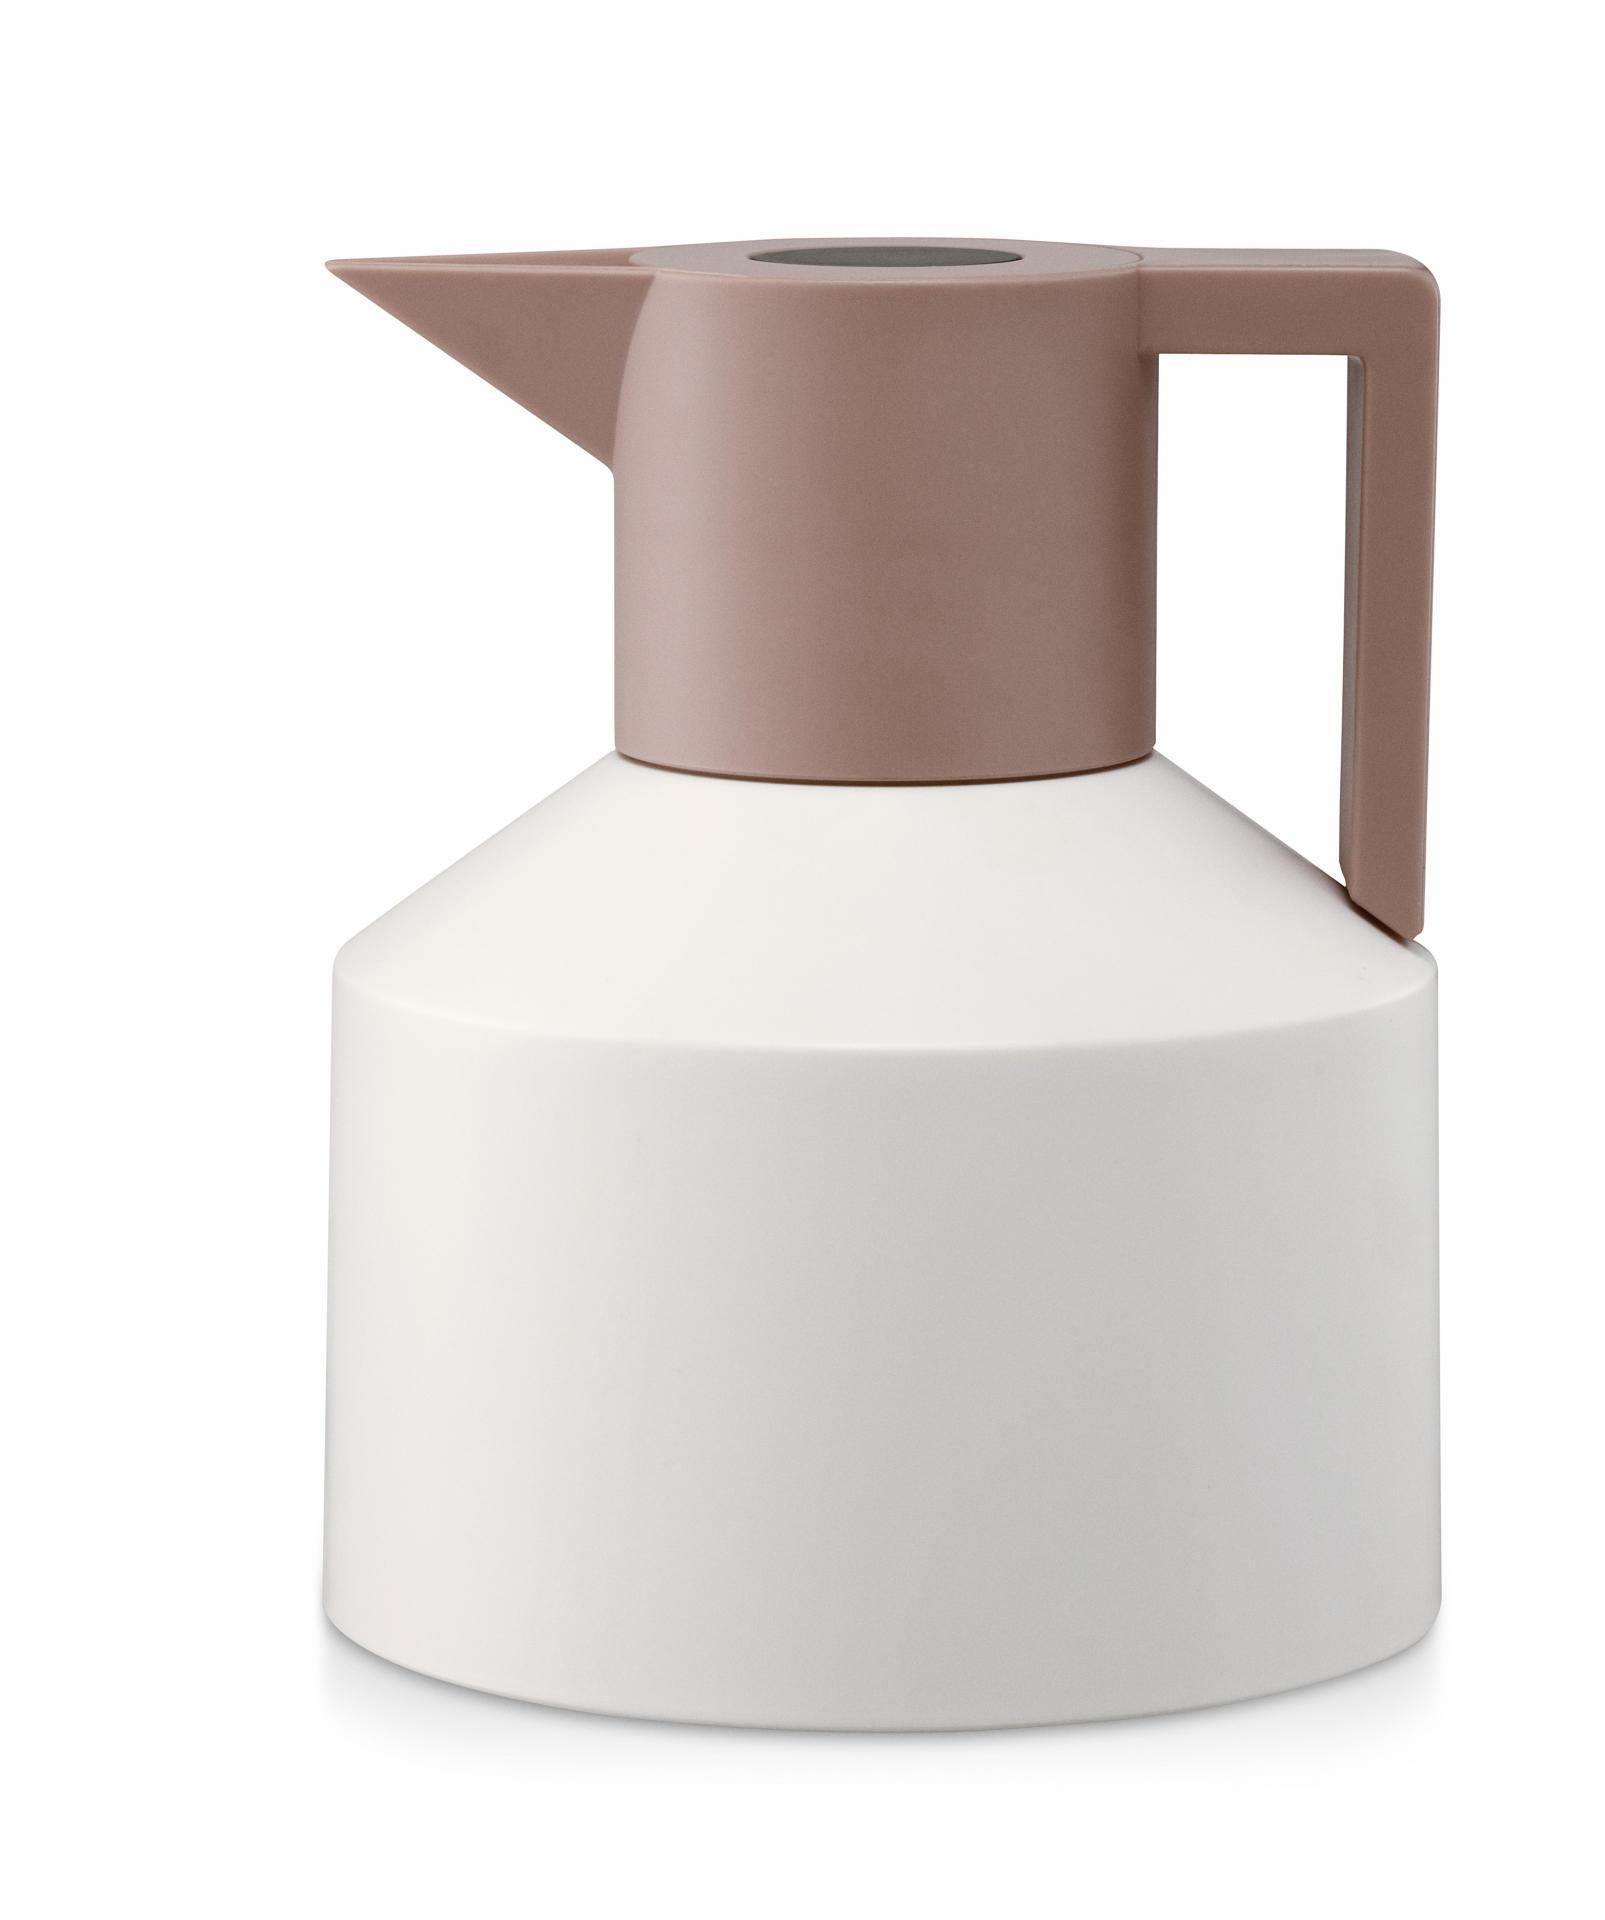 normann COPENHAGEN Termokonvice Geo White, béžová barva, čirá barva, sklo, plast